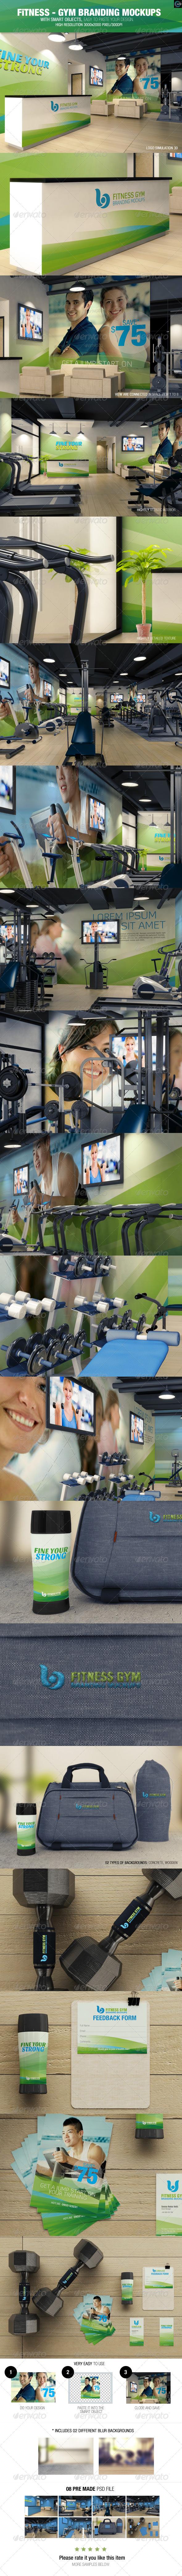 Fitness - Gym Branding Mockups - Logo Product Mock-Ups